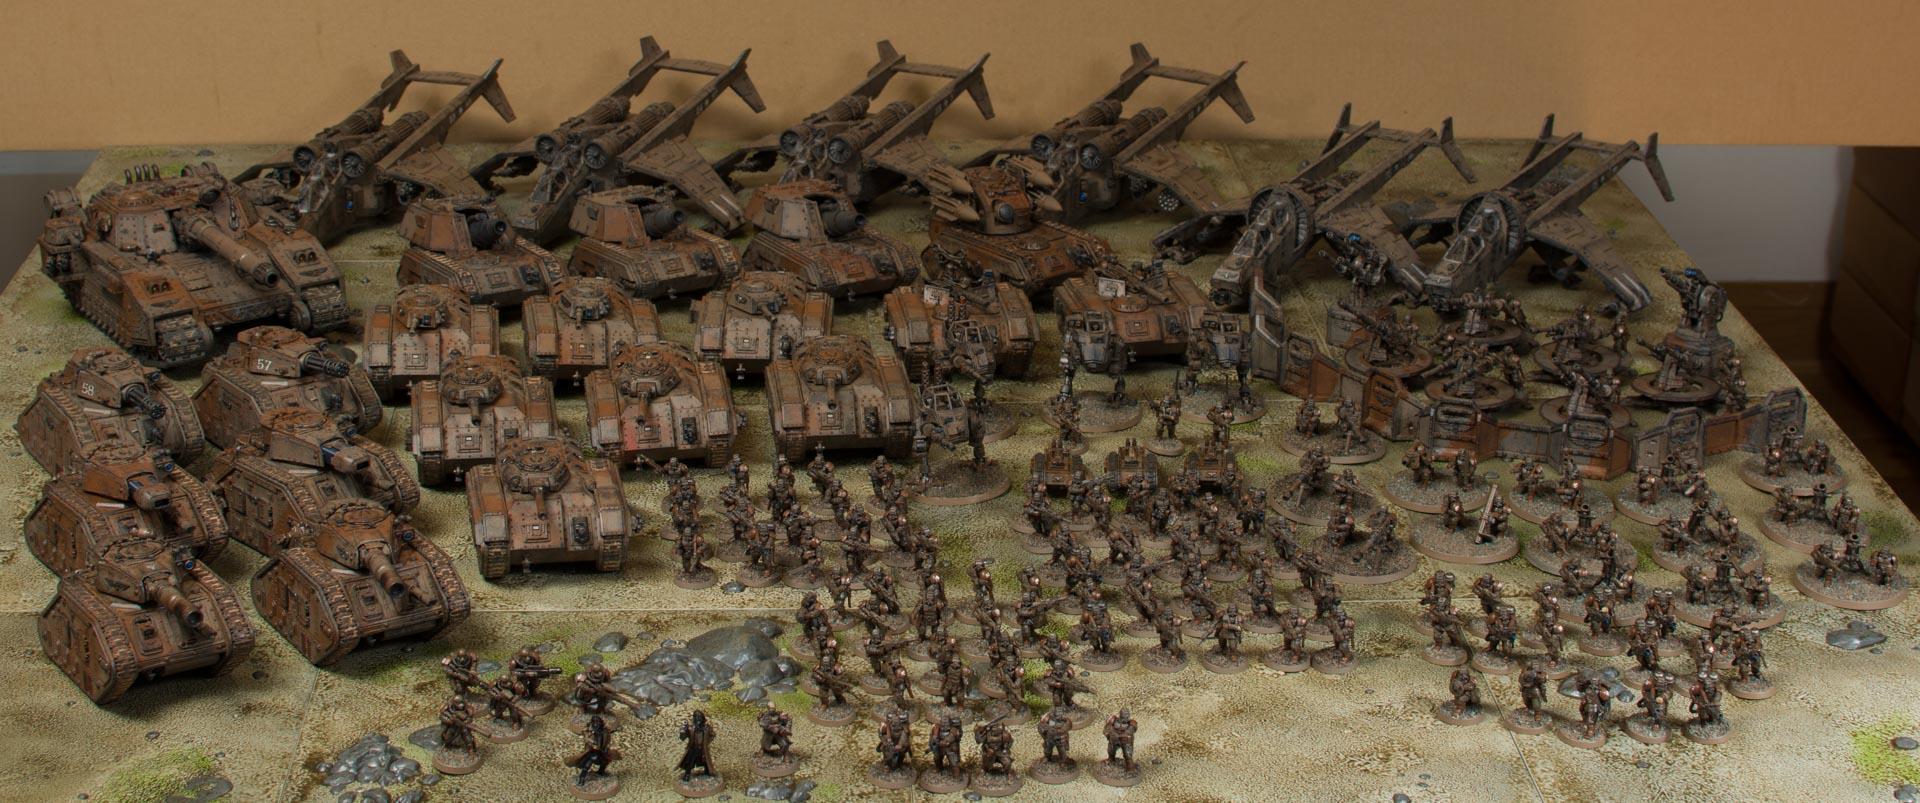 Guard Army